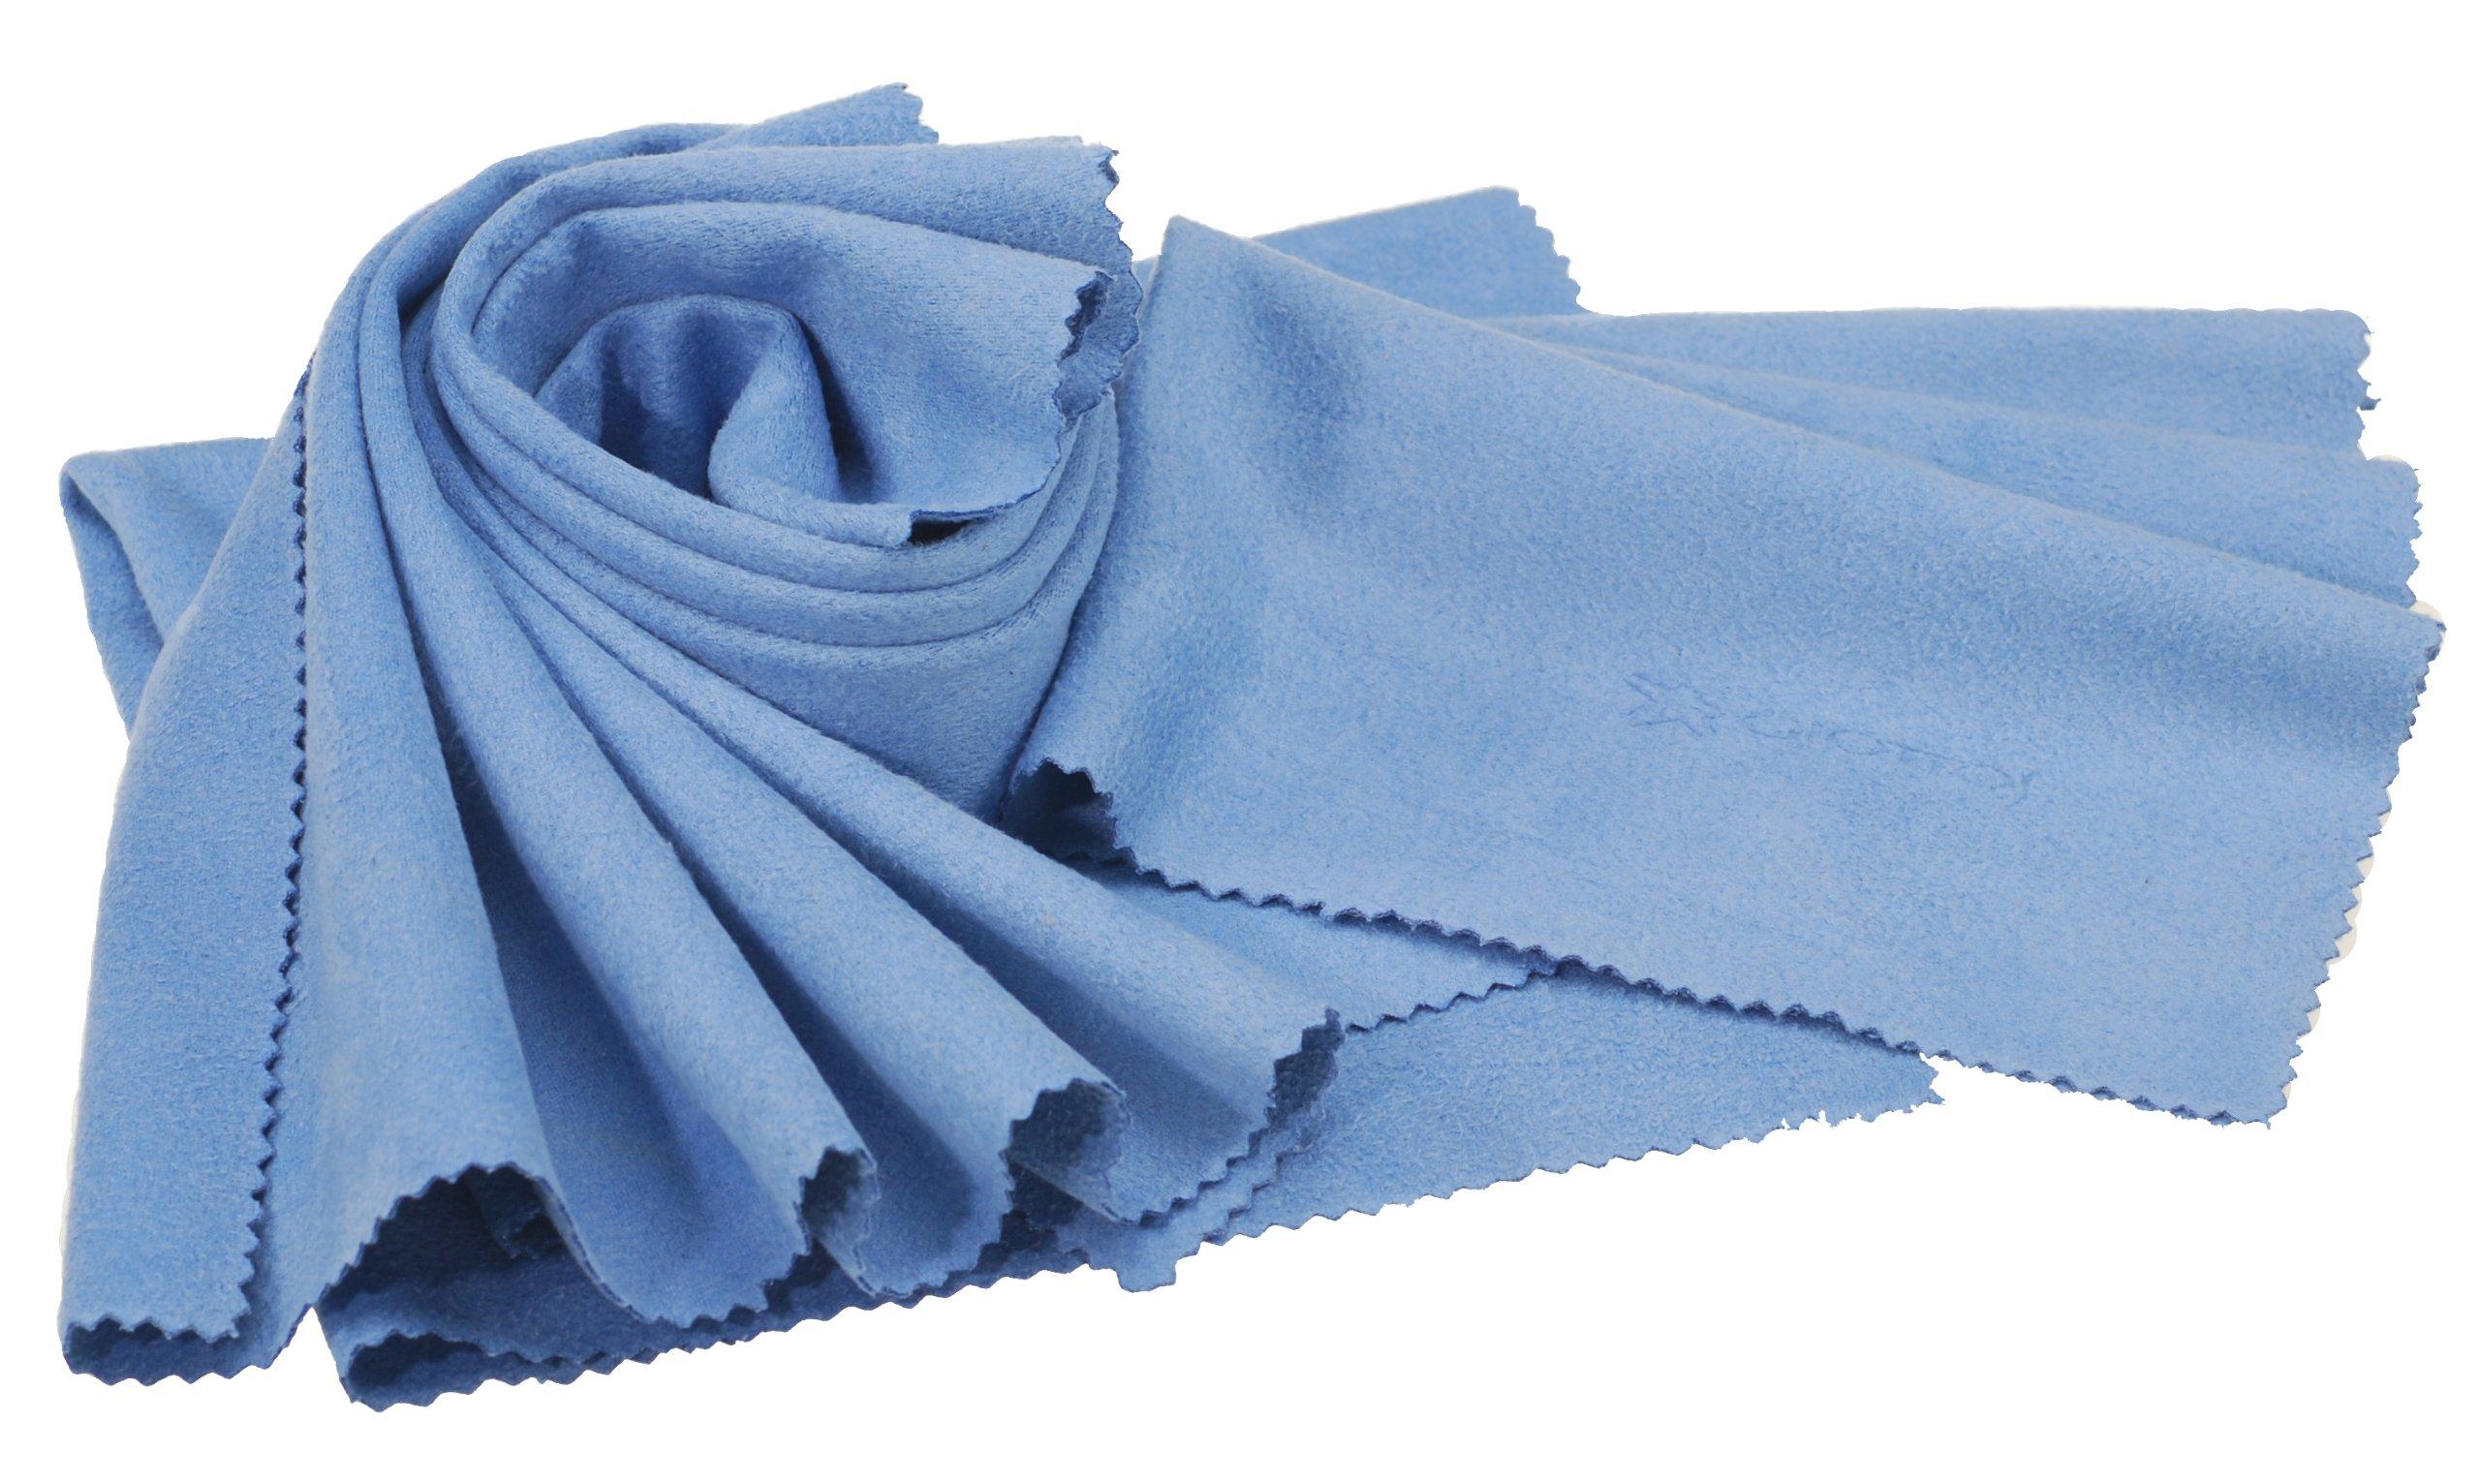 Giottos MFC-3614 Micro Fiber Cloth (Blue) by Giotto's